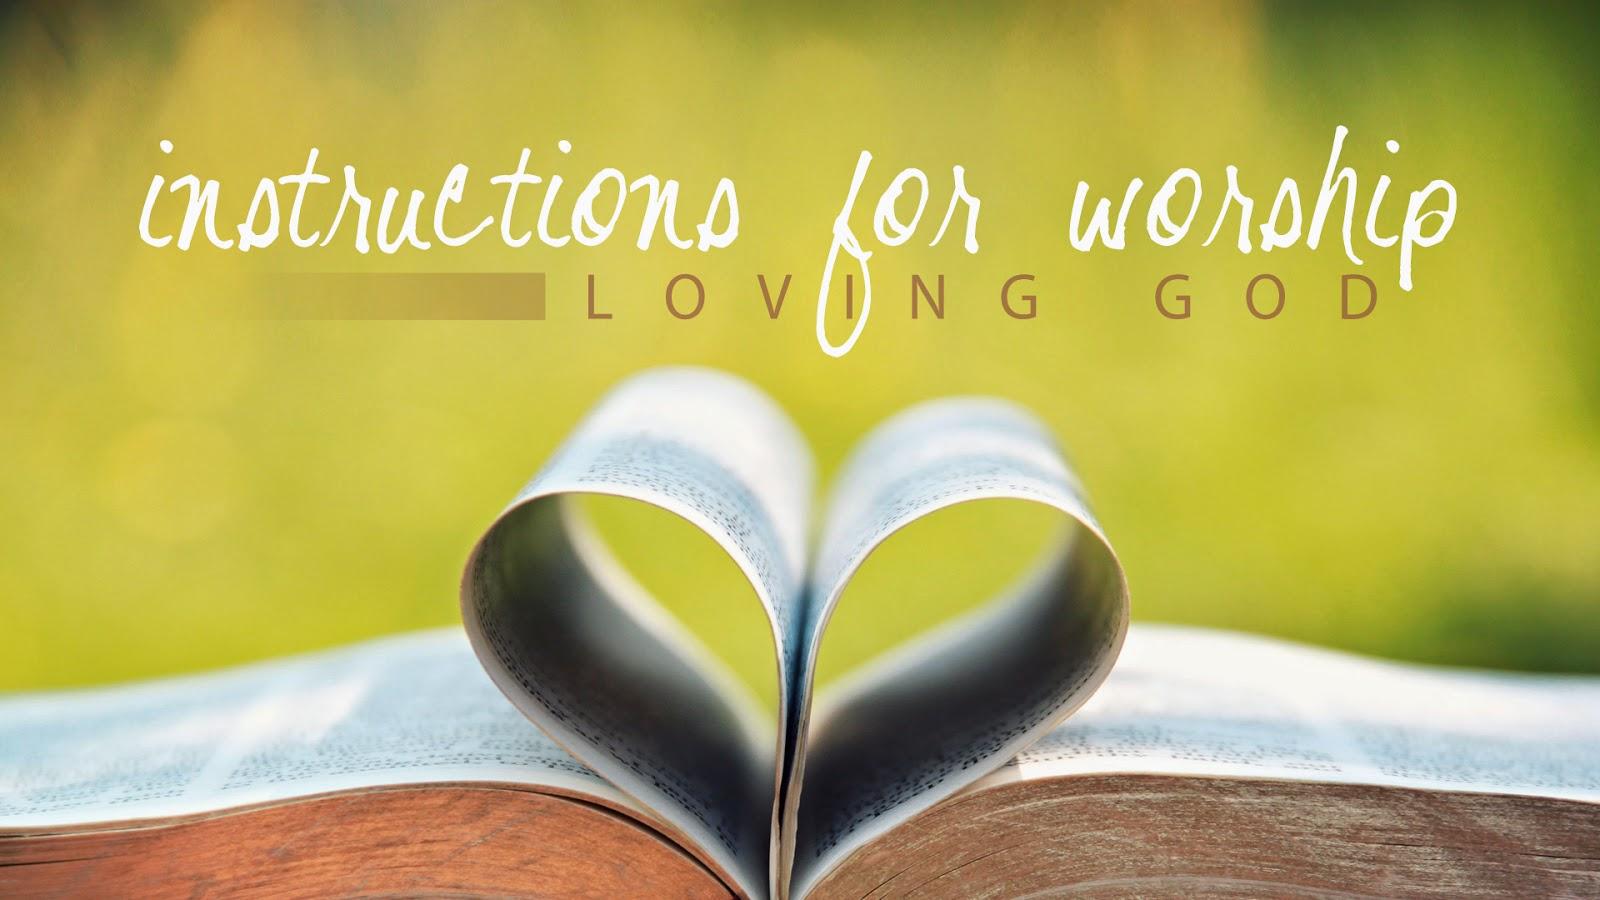 instructions for worship: loving God